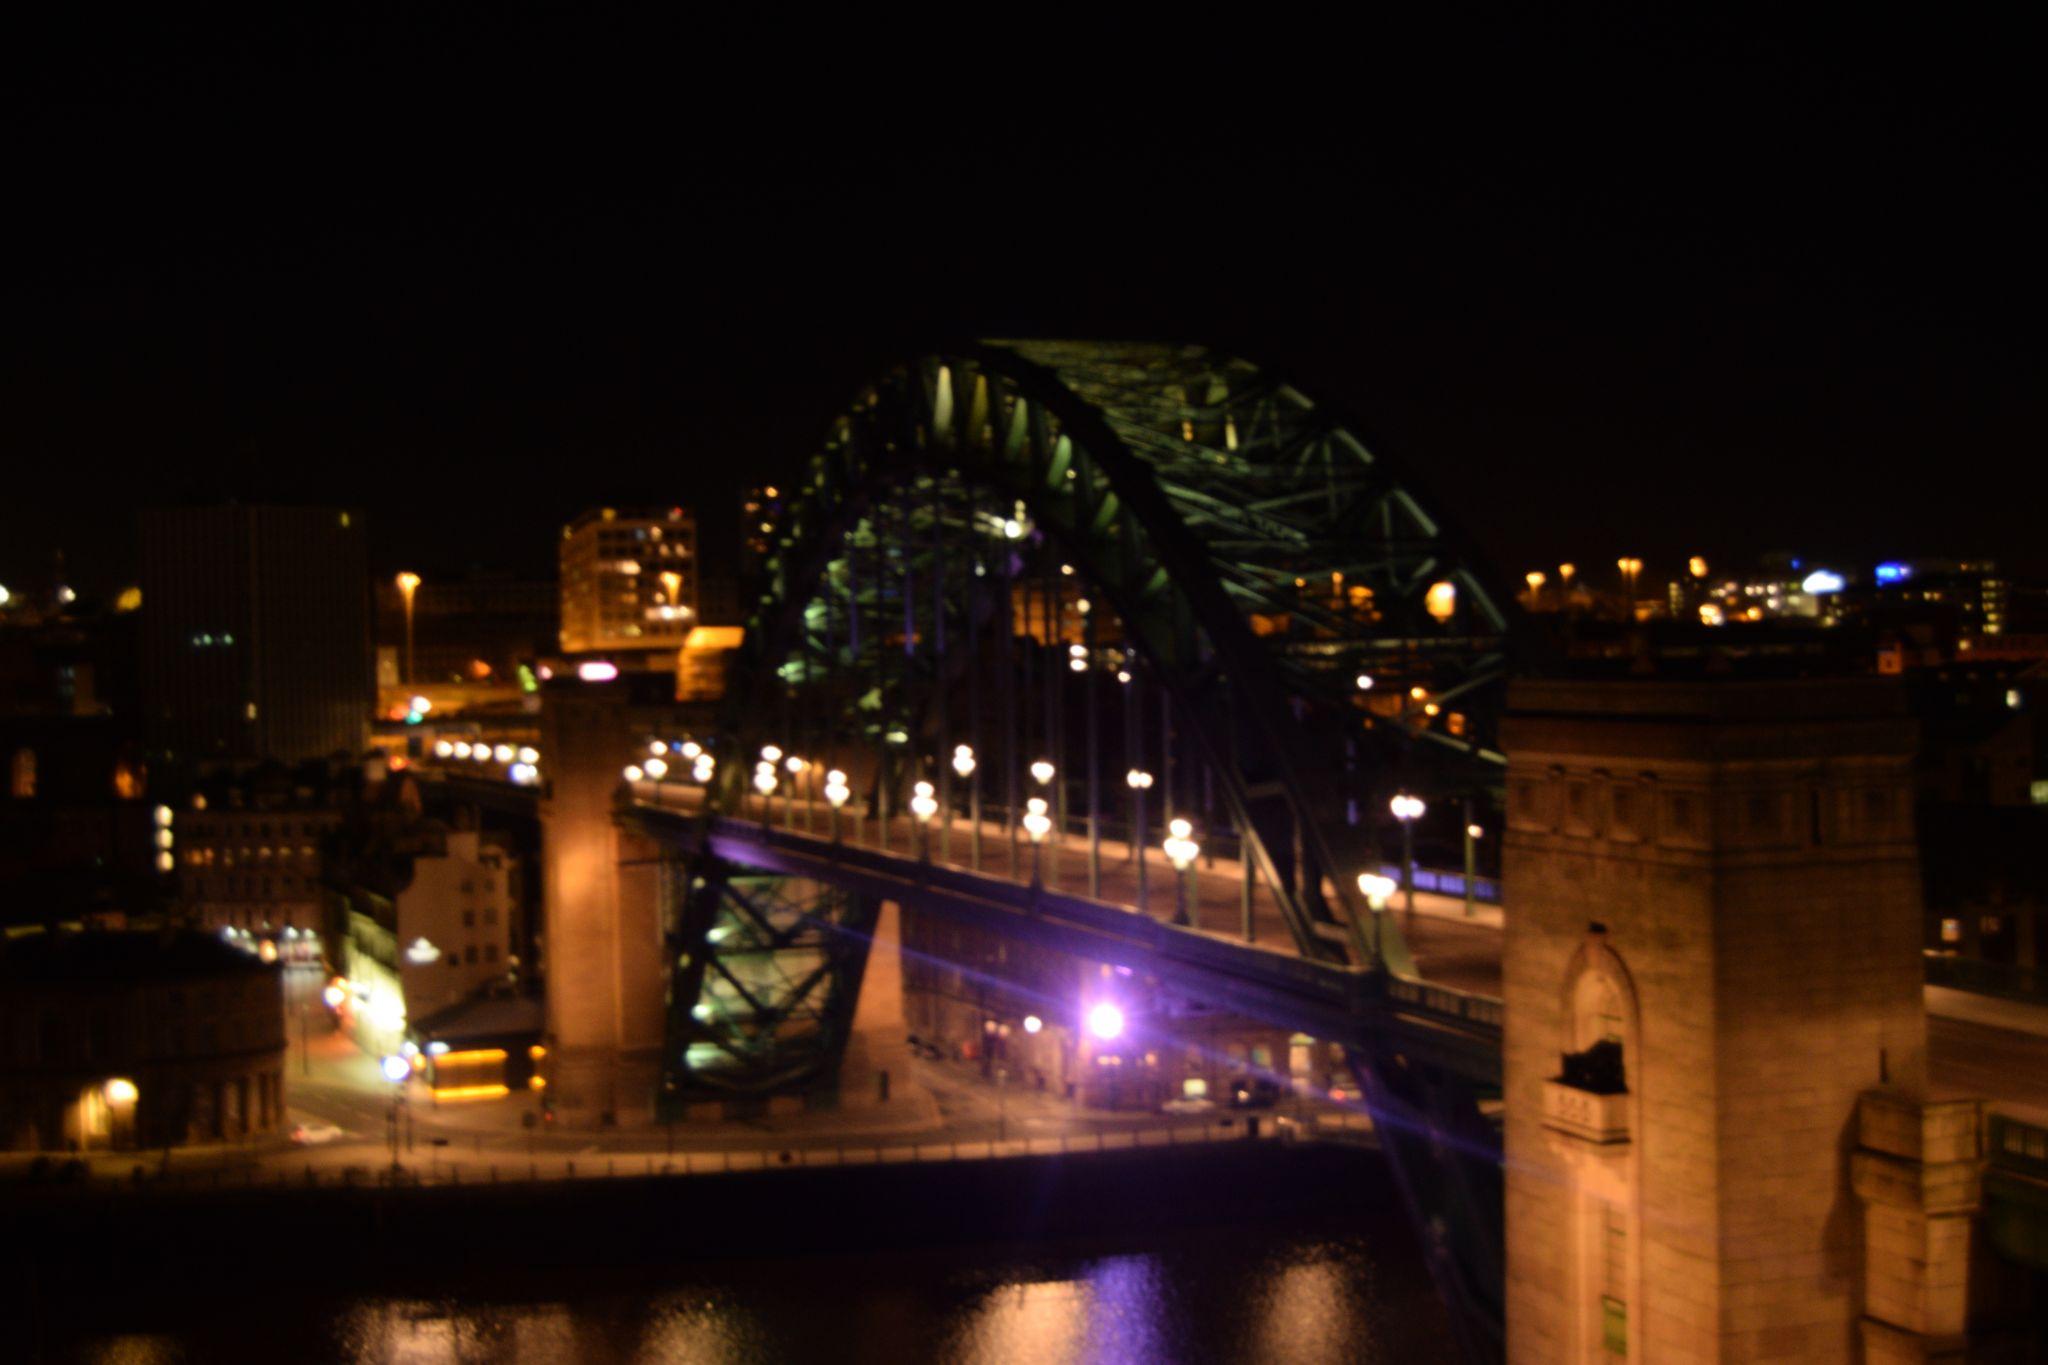 DSC 1434 1 1440x960 - Bloggers Sleepover at Hilton Newcastle Gateshead